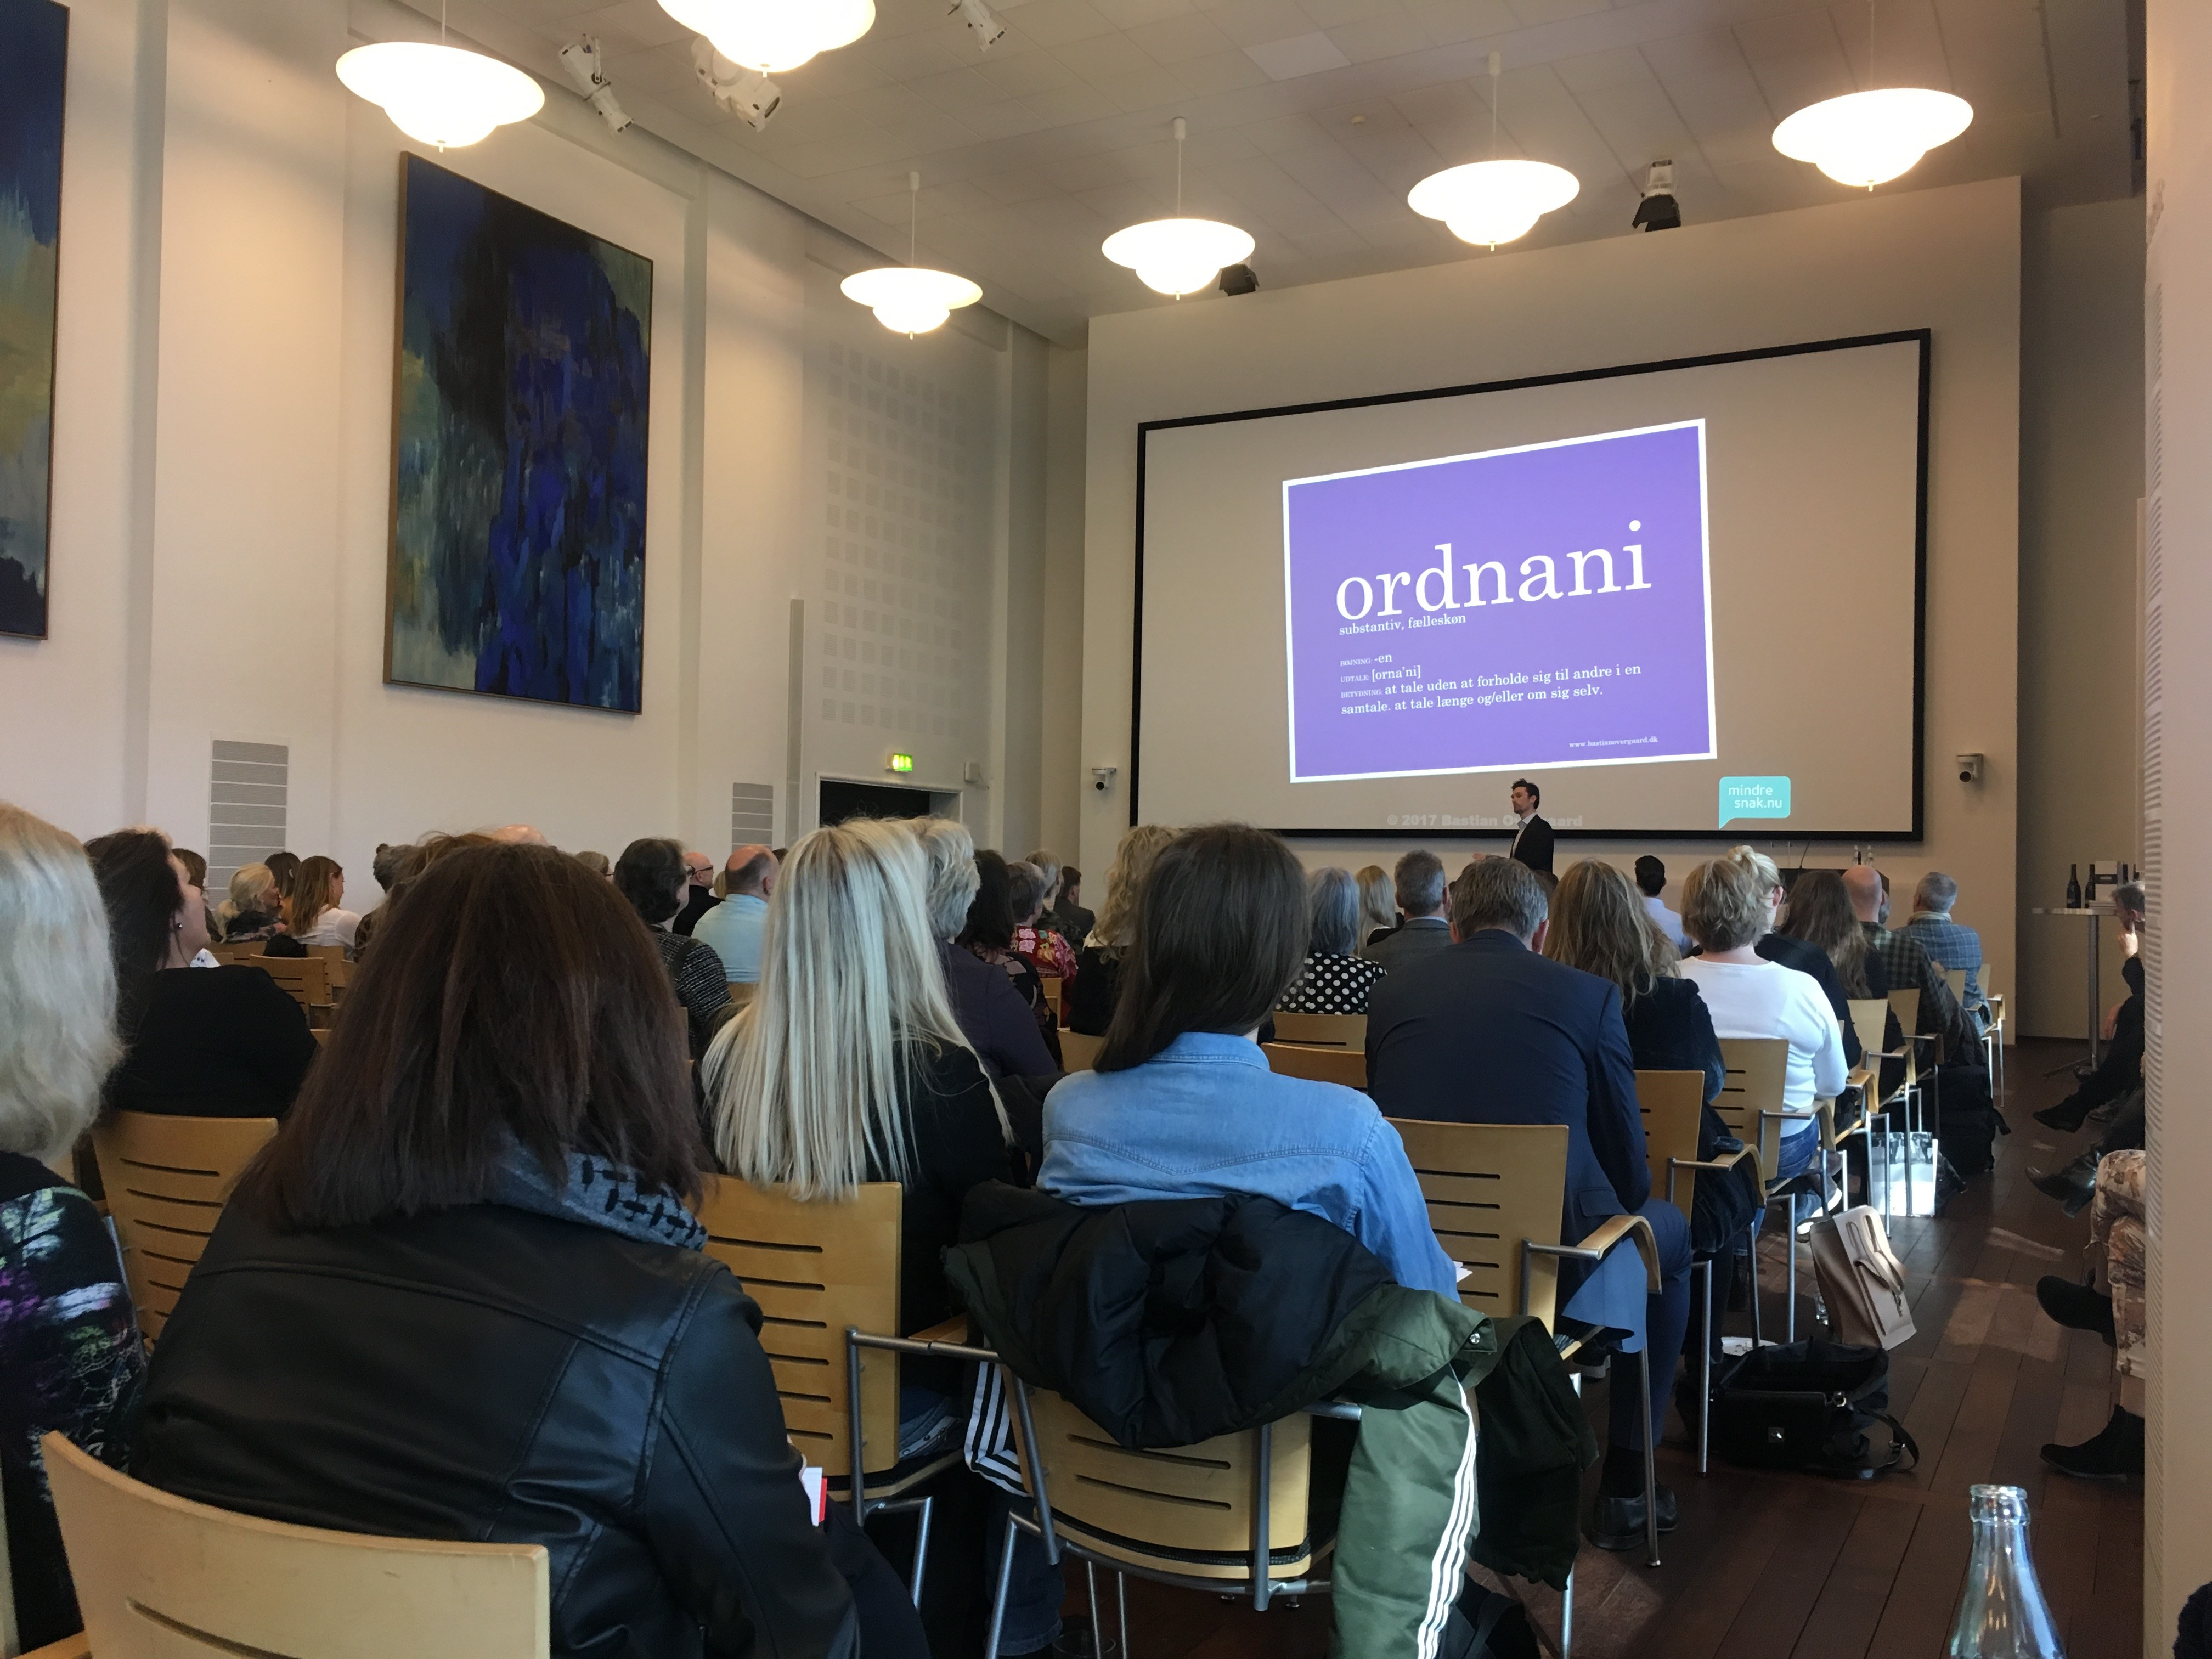 Bastian_Overgaard_ordnani